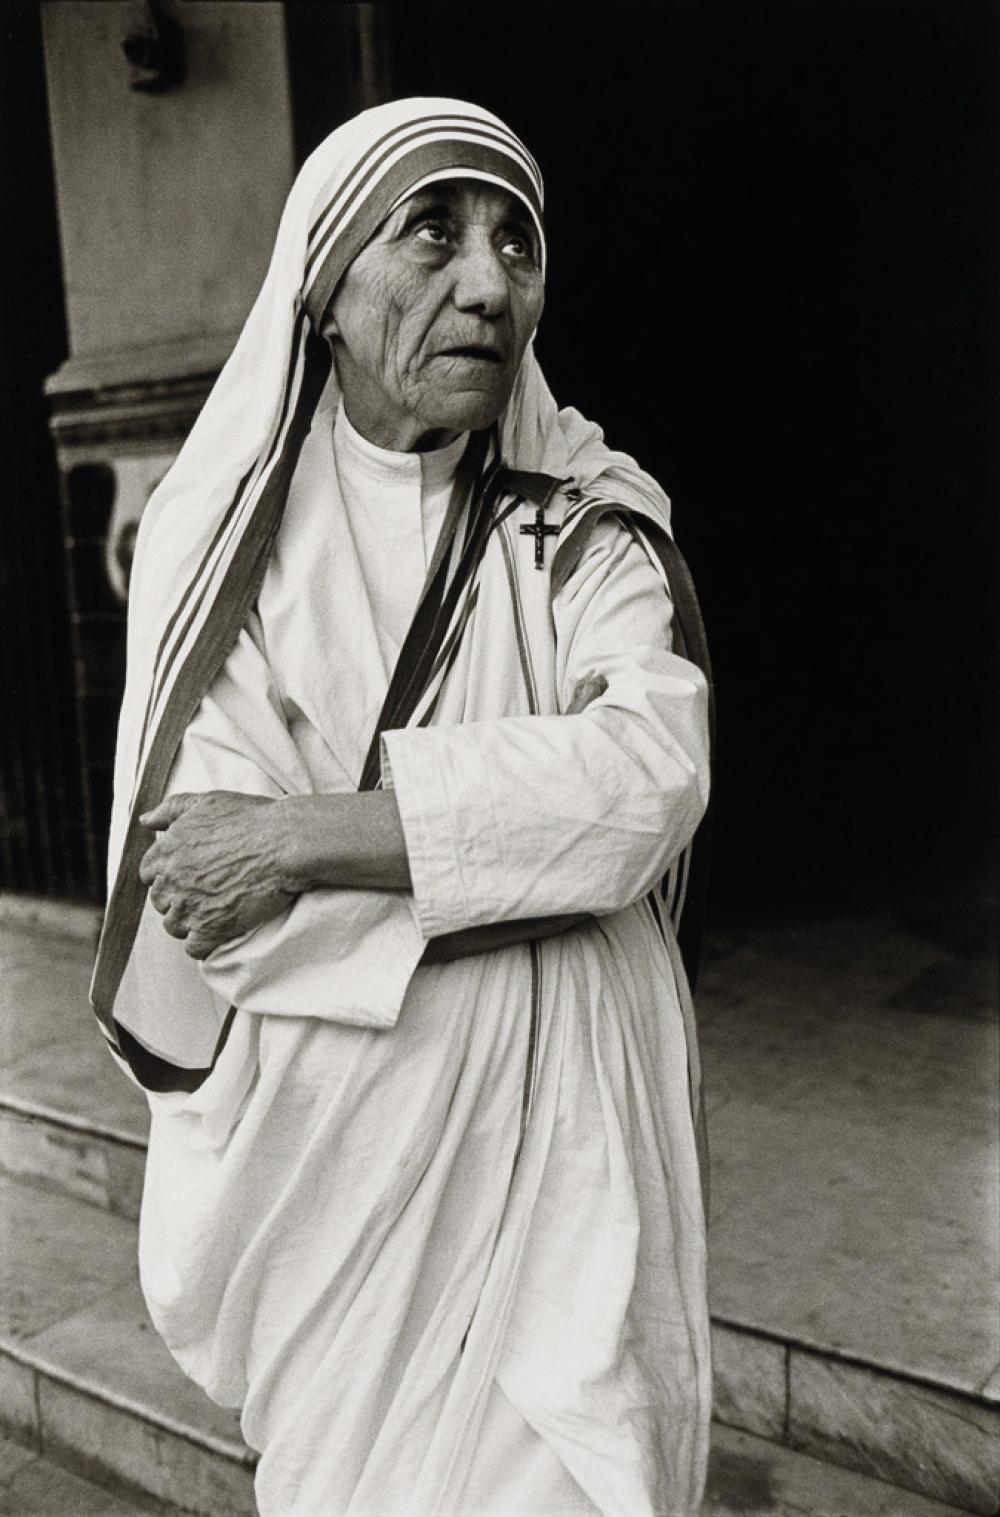 MARY ELLEN MARK (1940-2015) Mother Teresa, Calcutta.